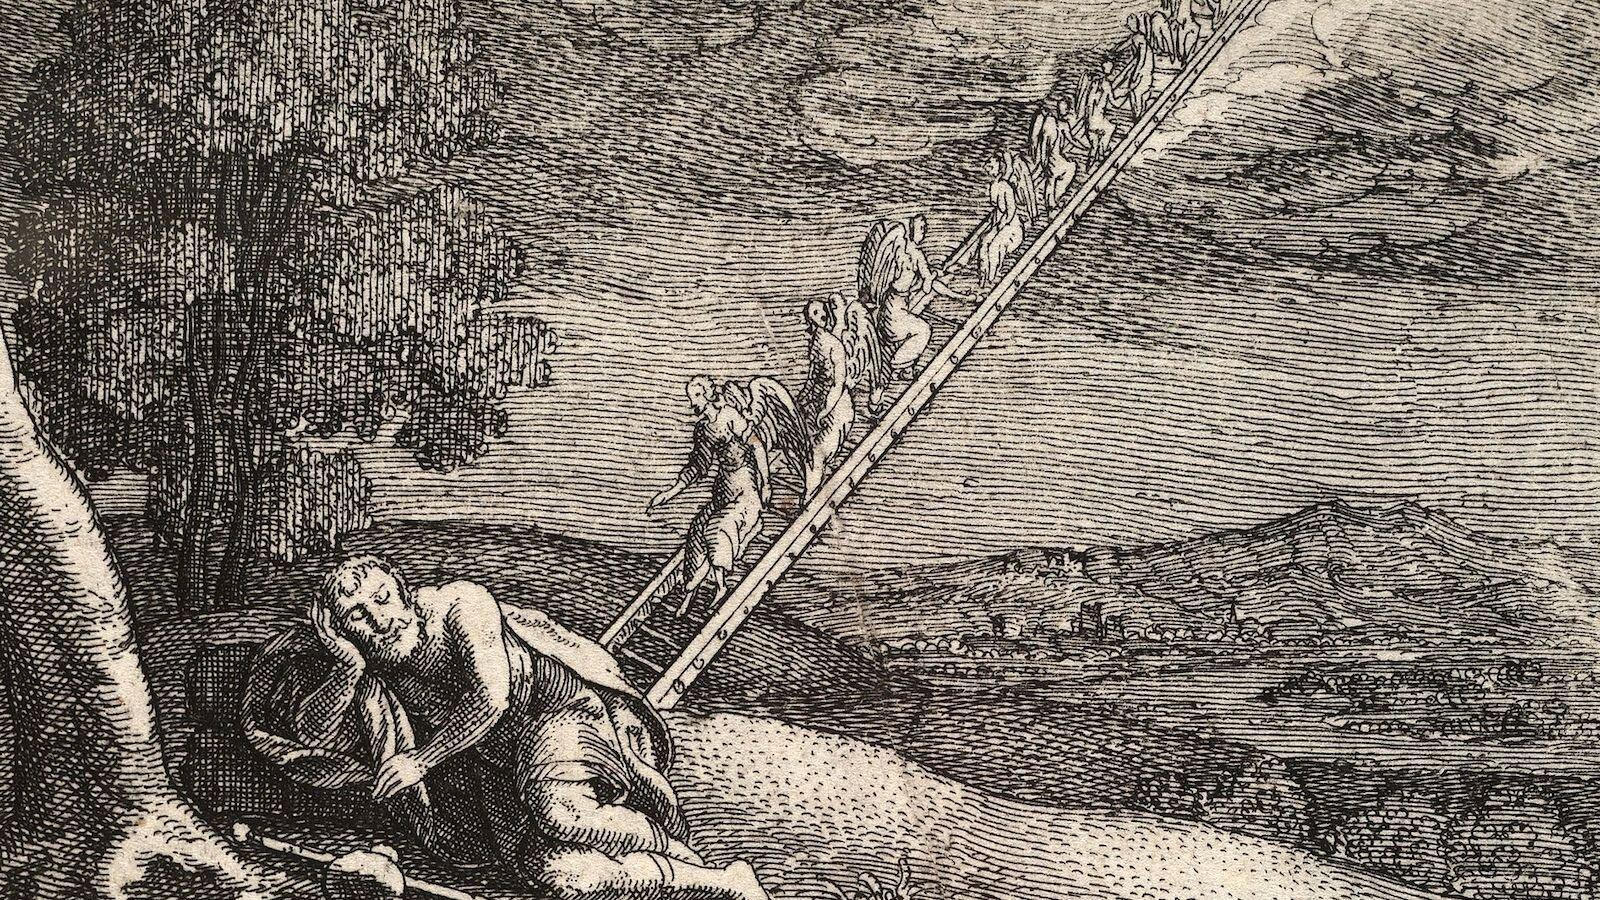 Wenceslas_Hollar_-_Jacobs_ladder_State_2.jpg